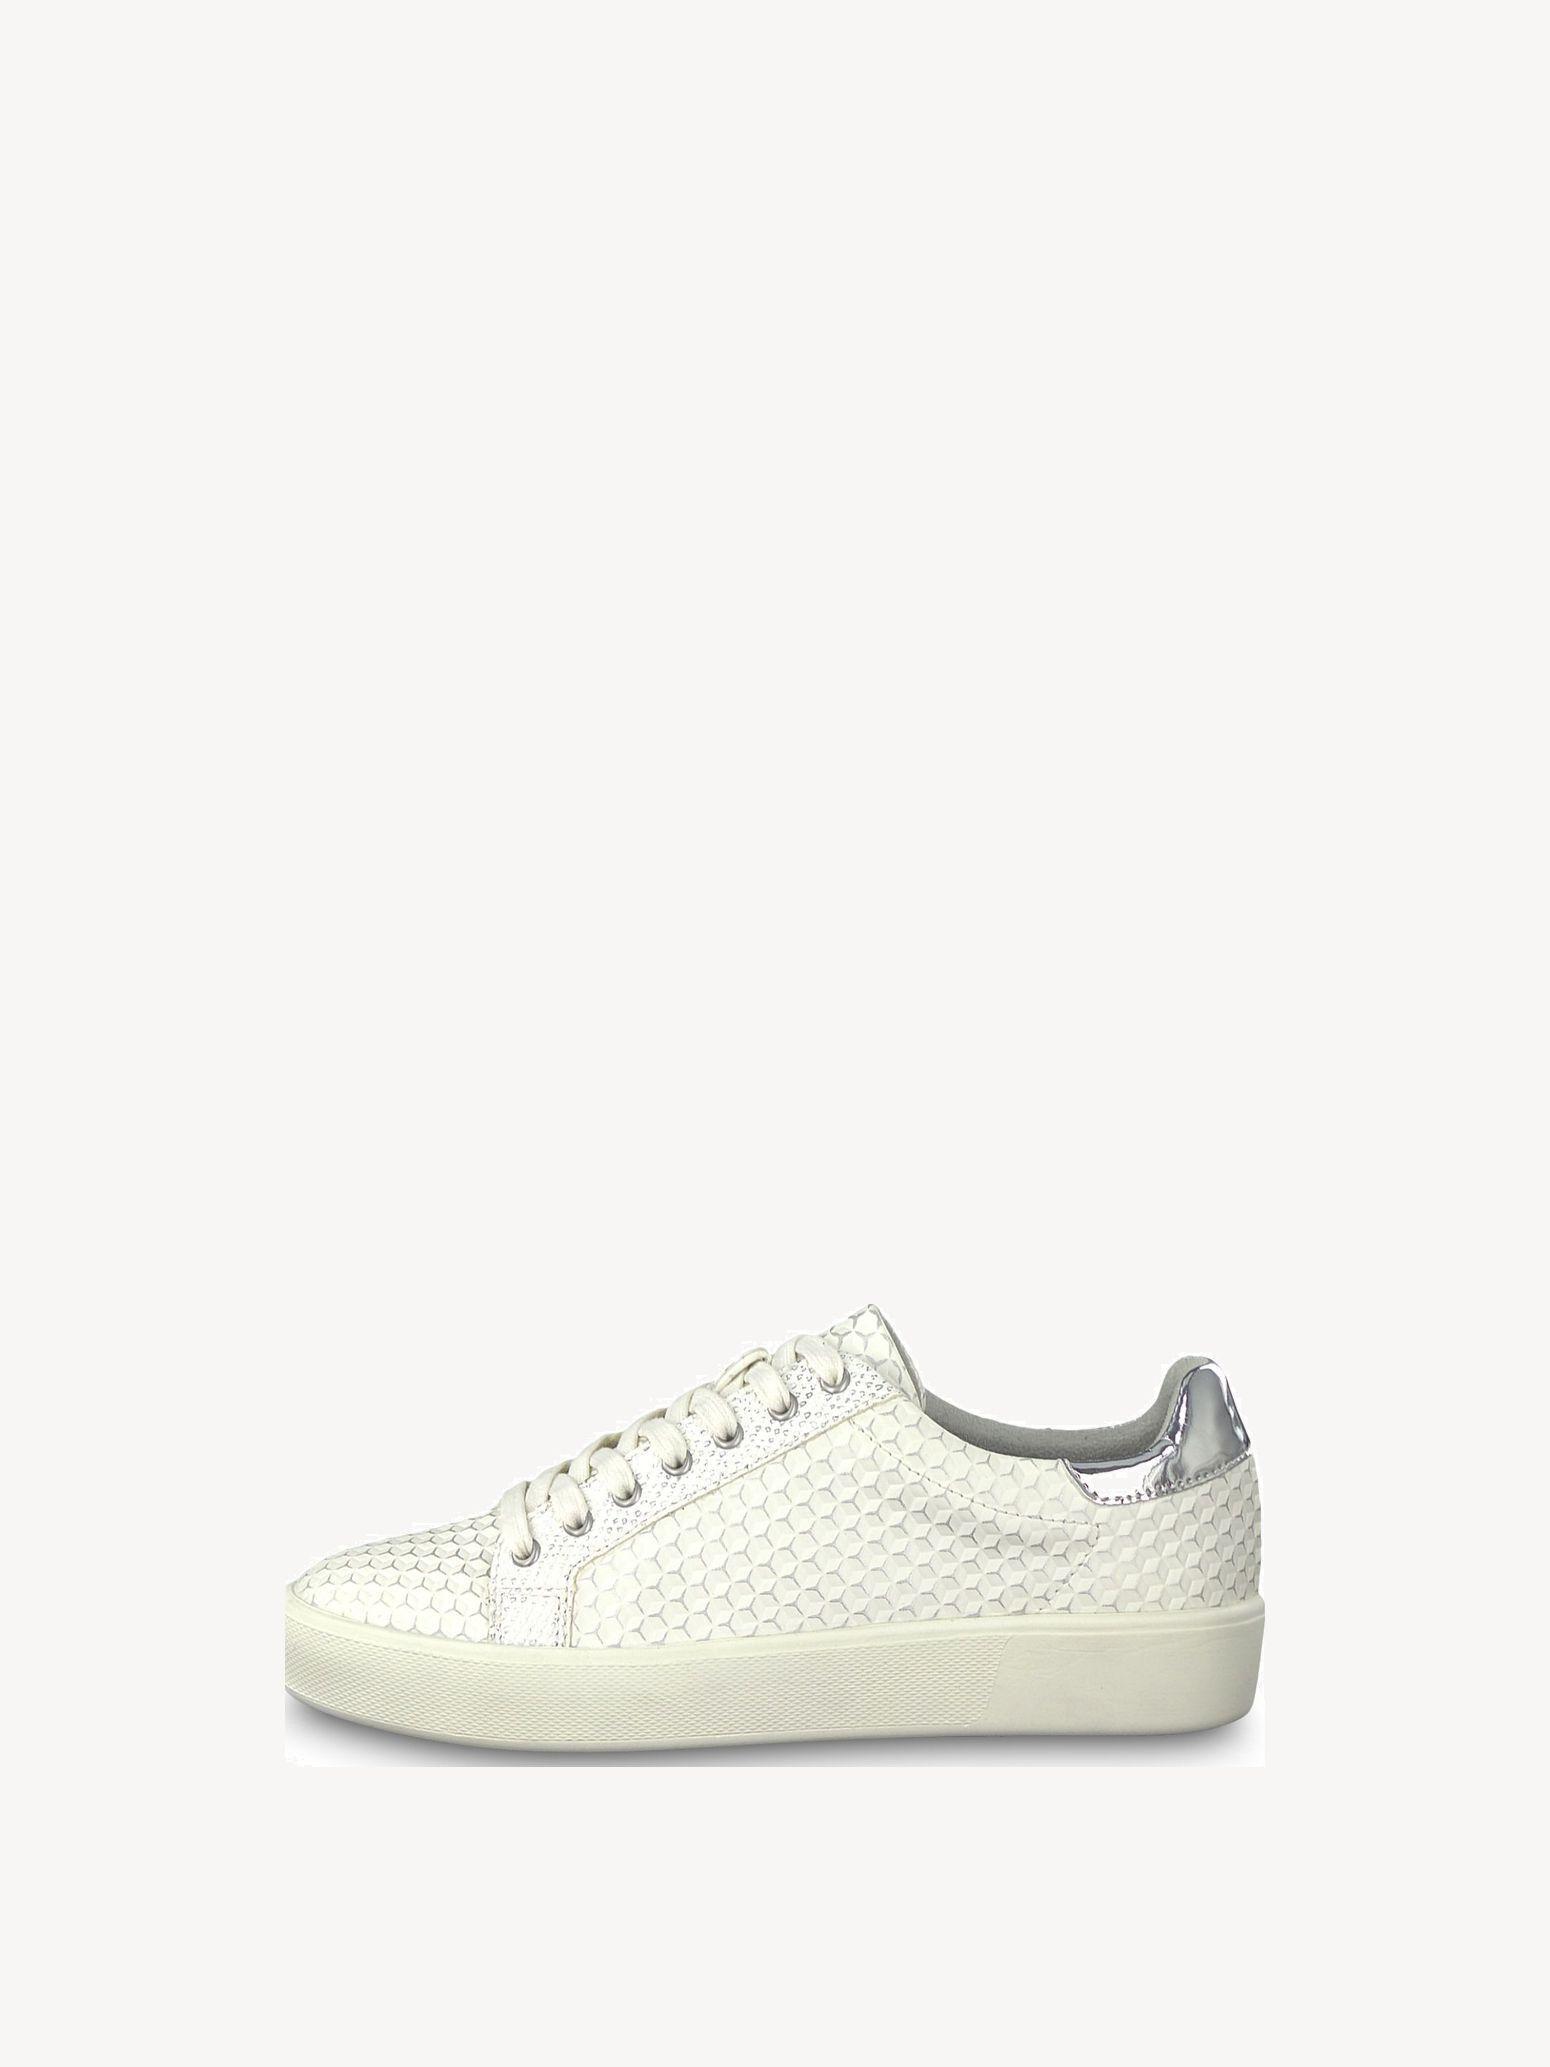 TAMARIS Sneaker weiß 0dxlLBao